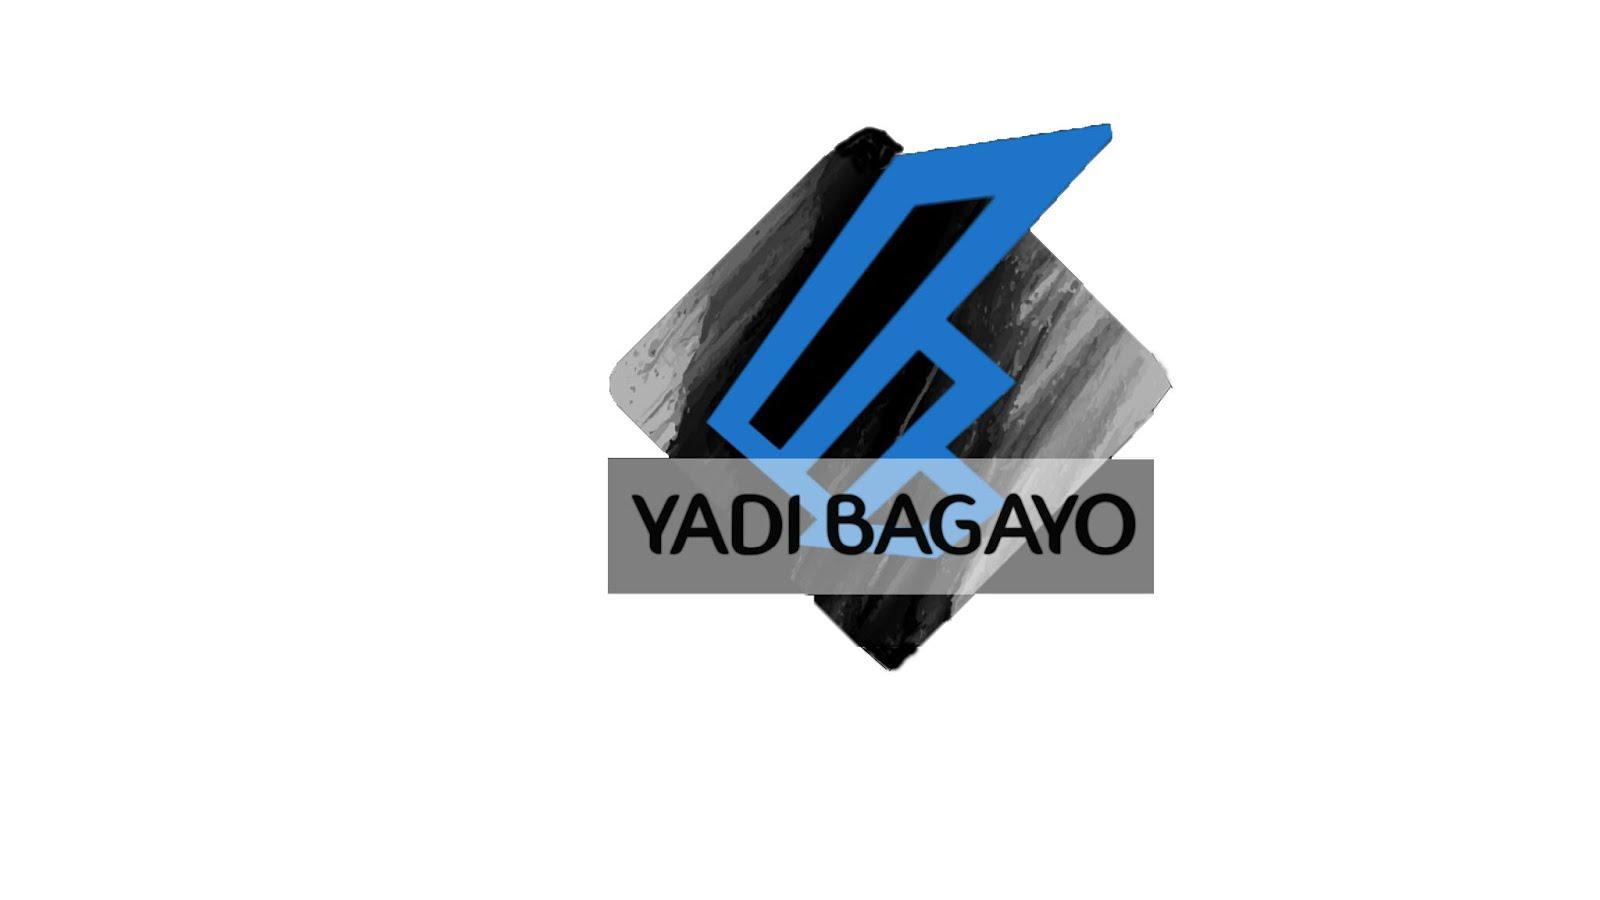 Yadi Bagayo On YouTube